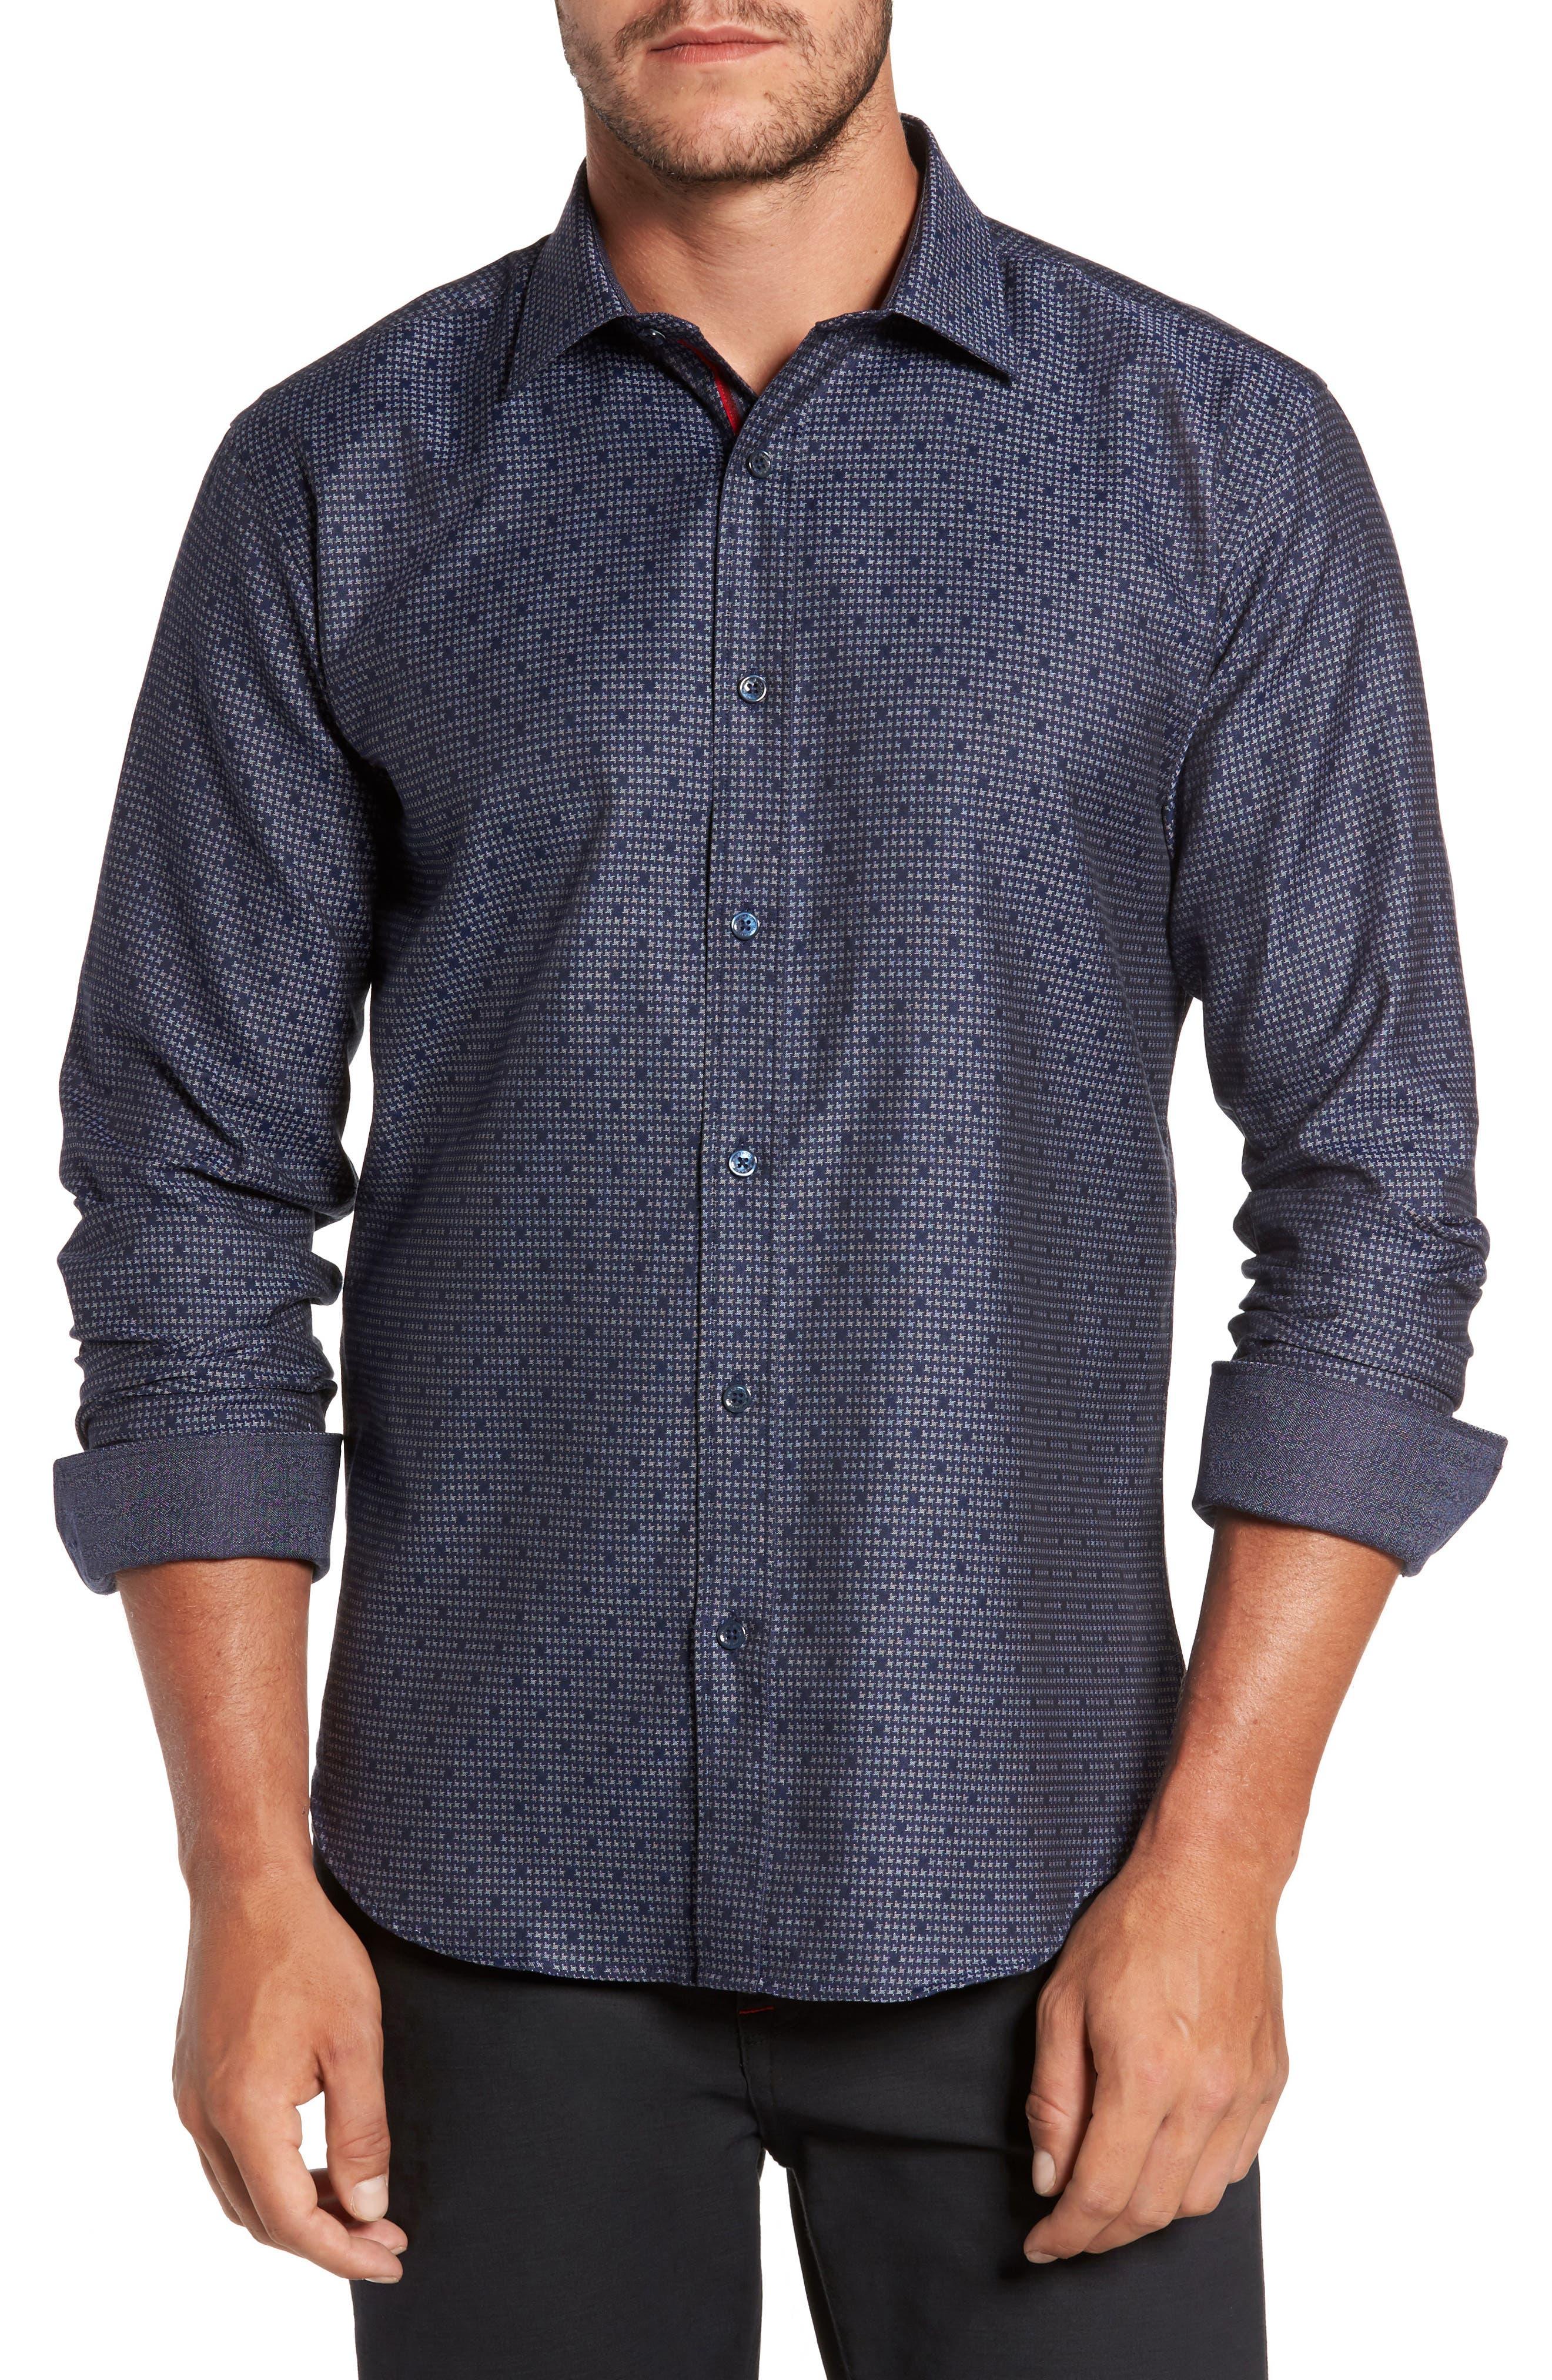 Alternate Image 1 Selected - Bugatchi Trim Fit Dot Houndstooth Sport Shirt